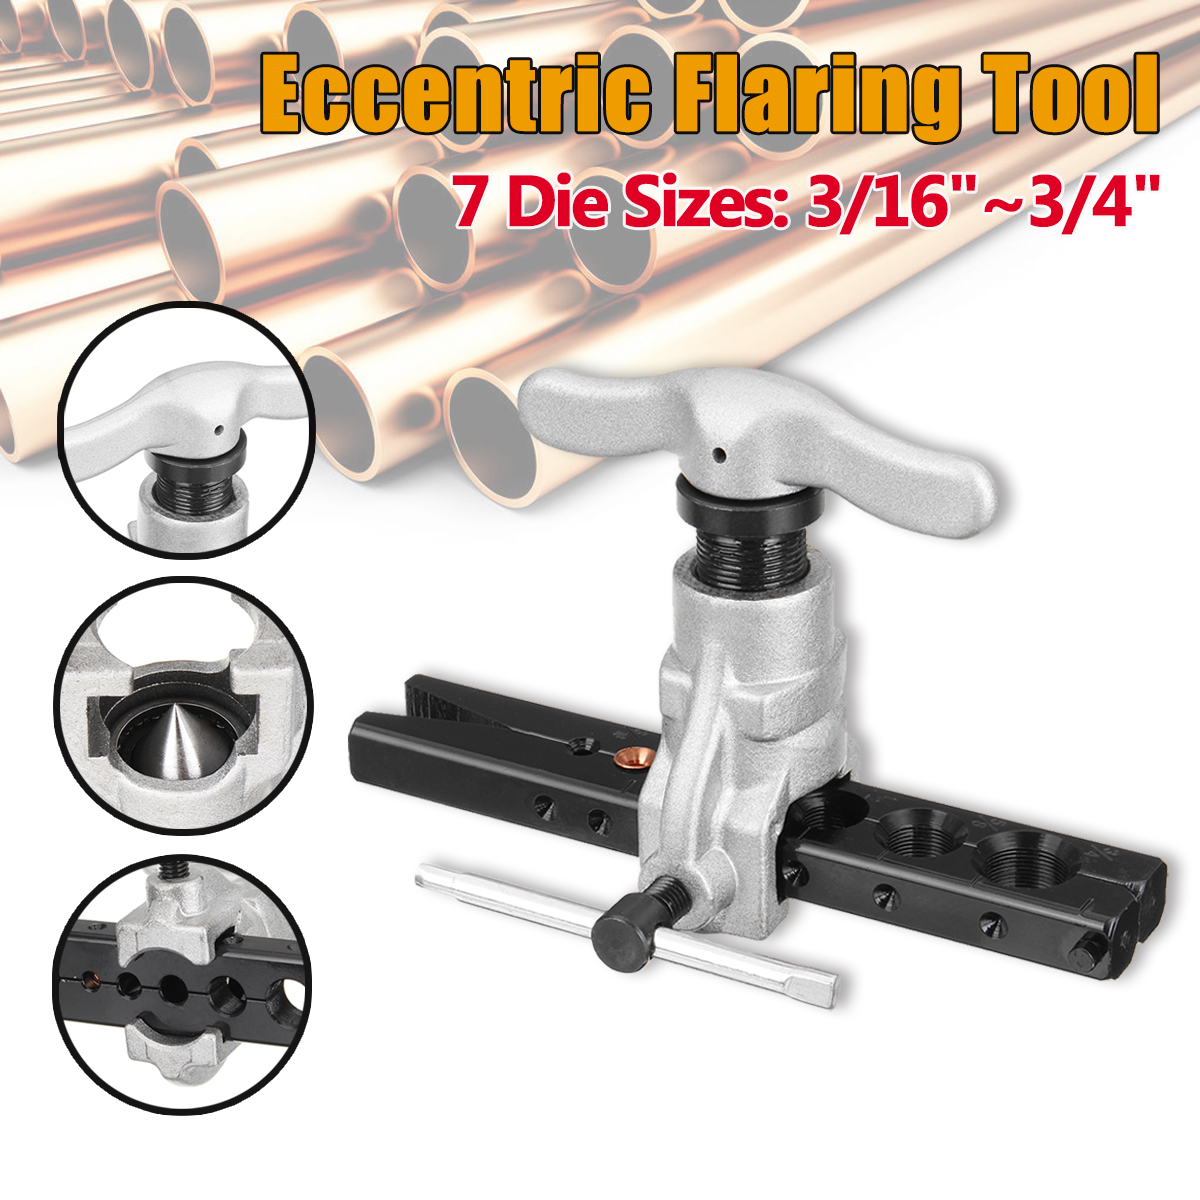 цена на 45 Degree Steel Eccentric Cone Flaring Tool 3/16-3/4 Refrigeration Copper Tube